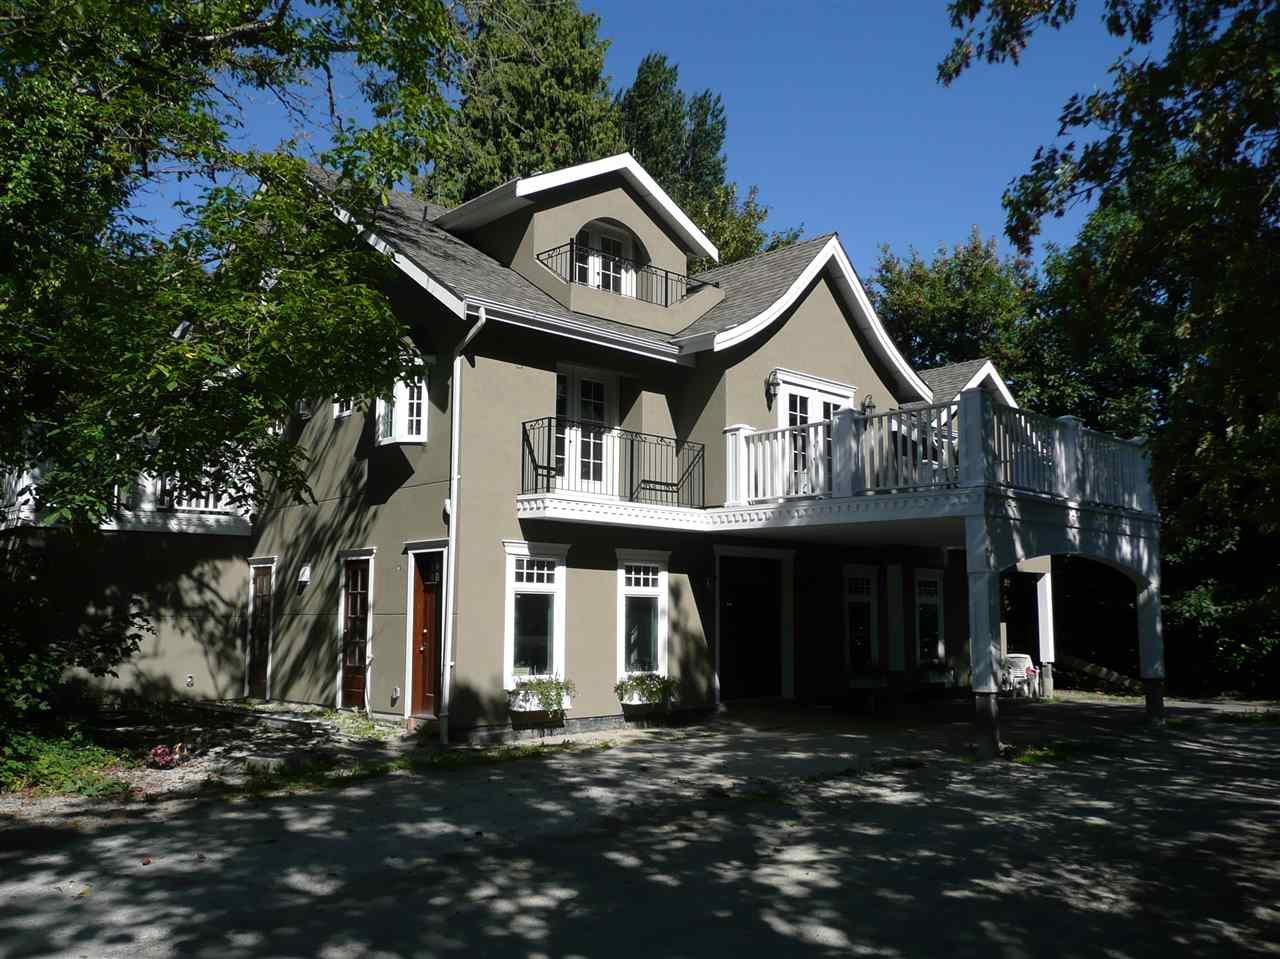 Main Photo: 4617 ARTHUR Drive in Delta: Ladner Elementary House for sale (Ladner)  : MLS®# R2086388